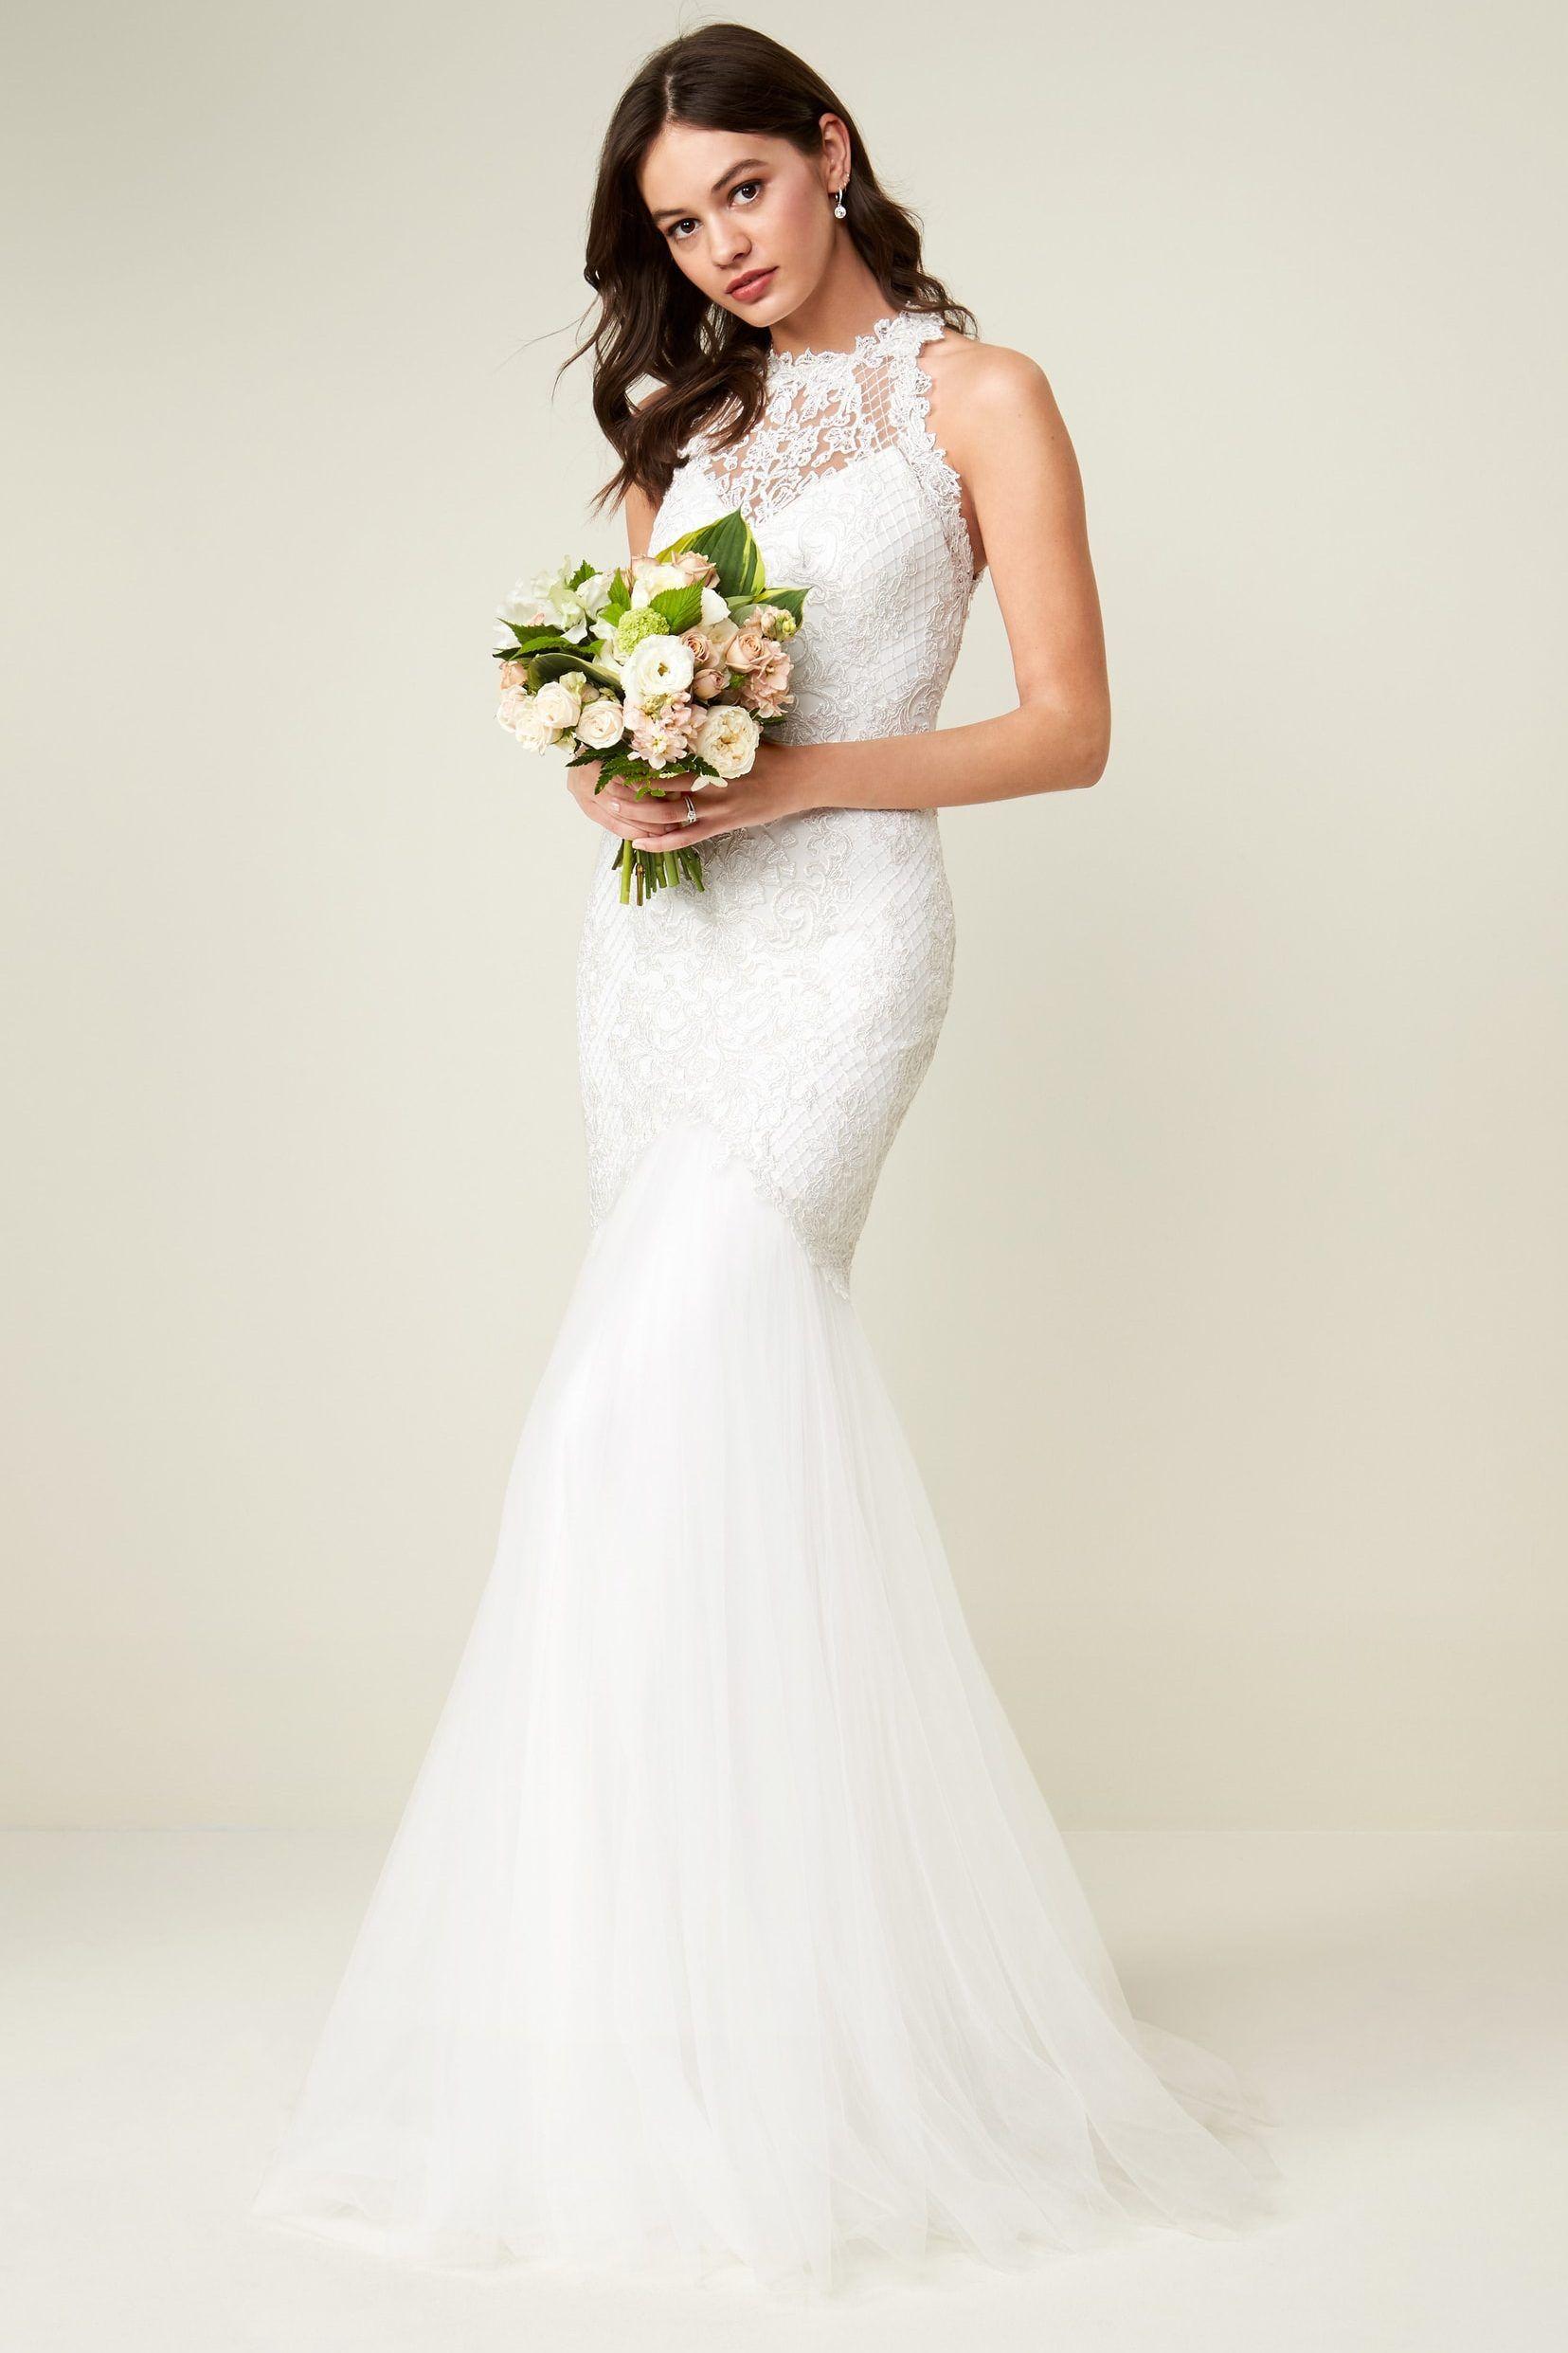 Lace Halter Neck Mermaid Silhouette Wedding Dress Chic Vintage Brides Tadashi Shoji Wedding Dress Ball Gowns Wedding Ivory Wedding Gown [ 2483 x 1655 Pixel ]